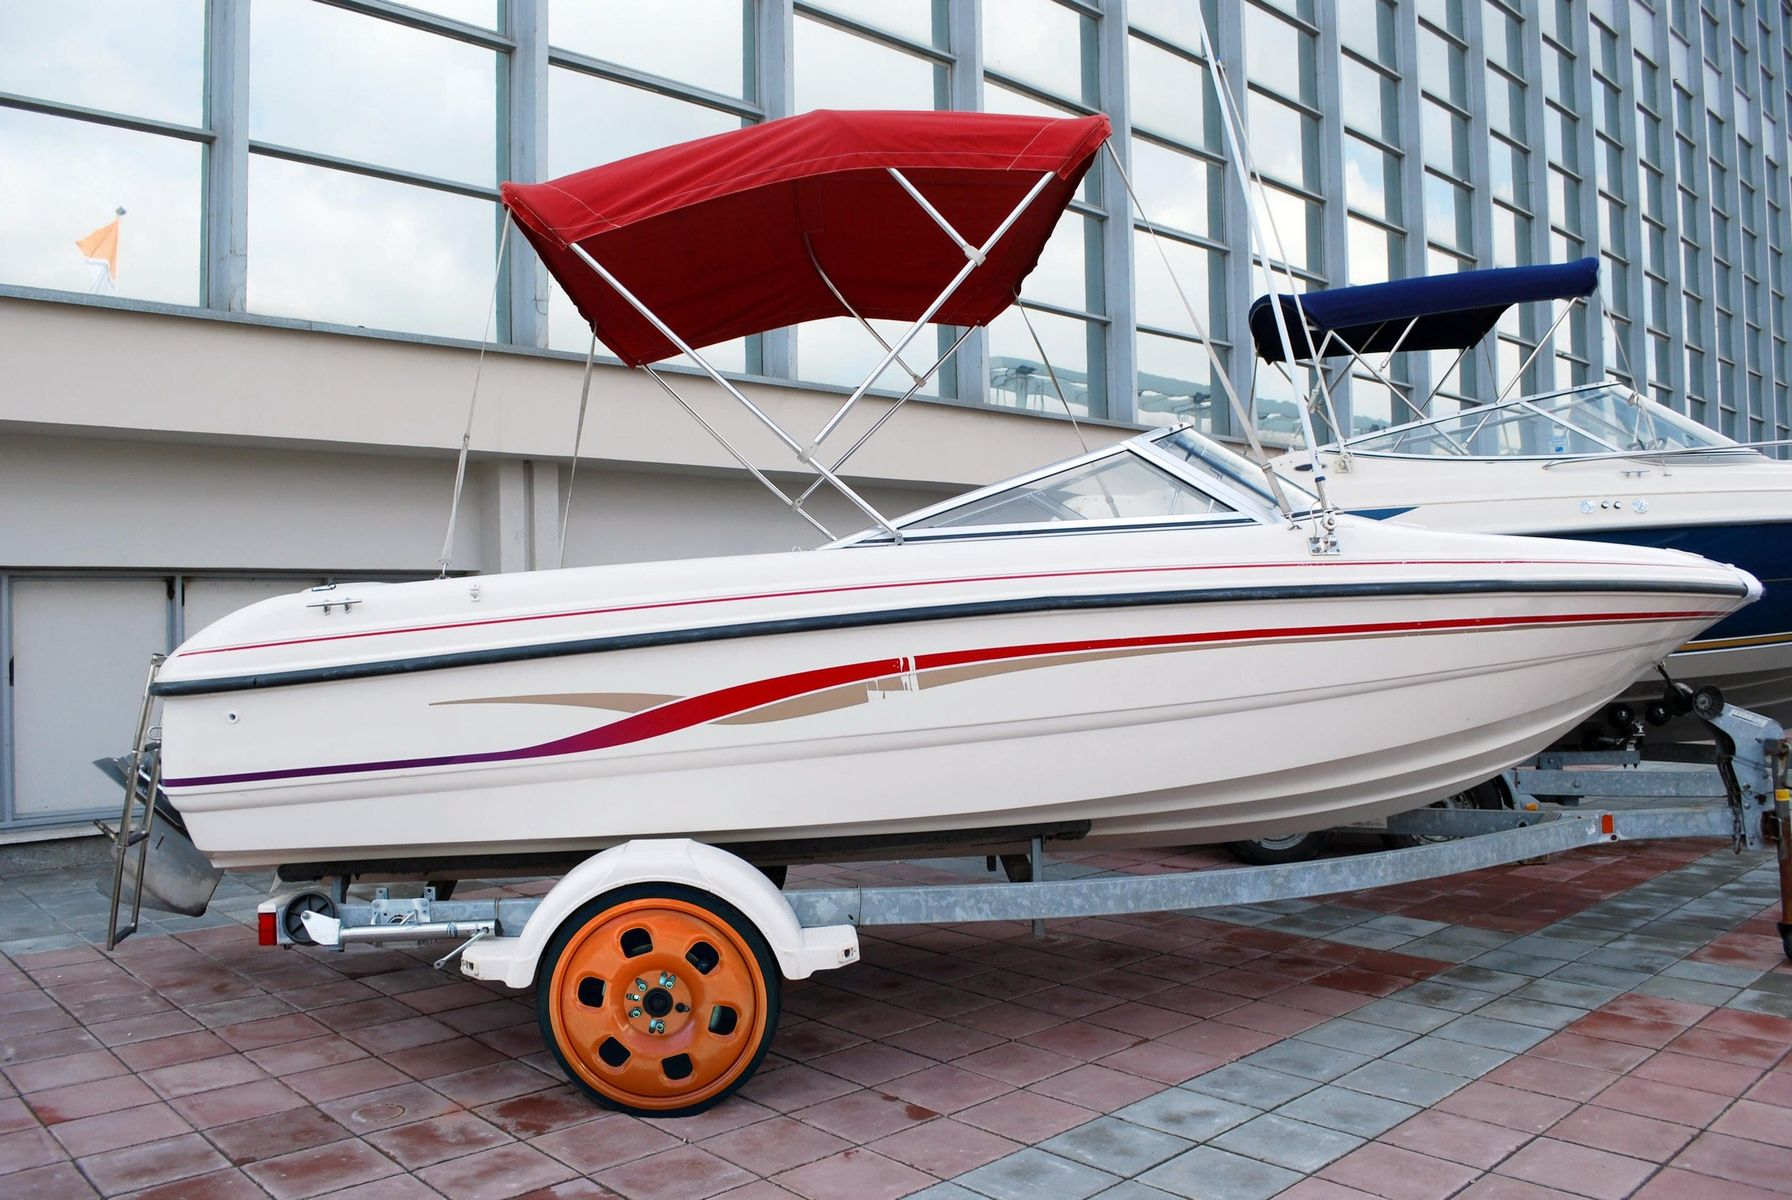 Boat wheel replaced by Guniwheel